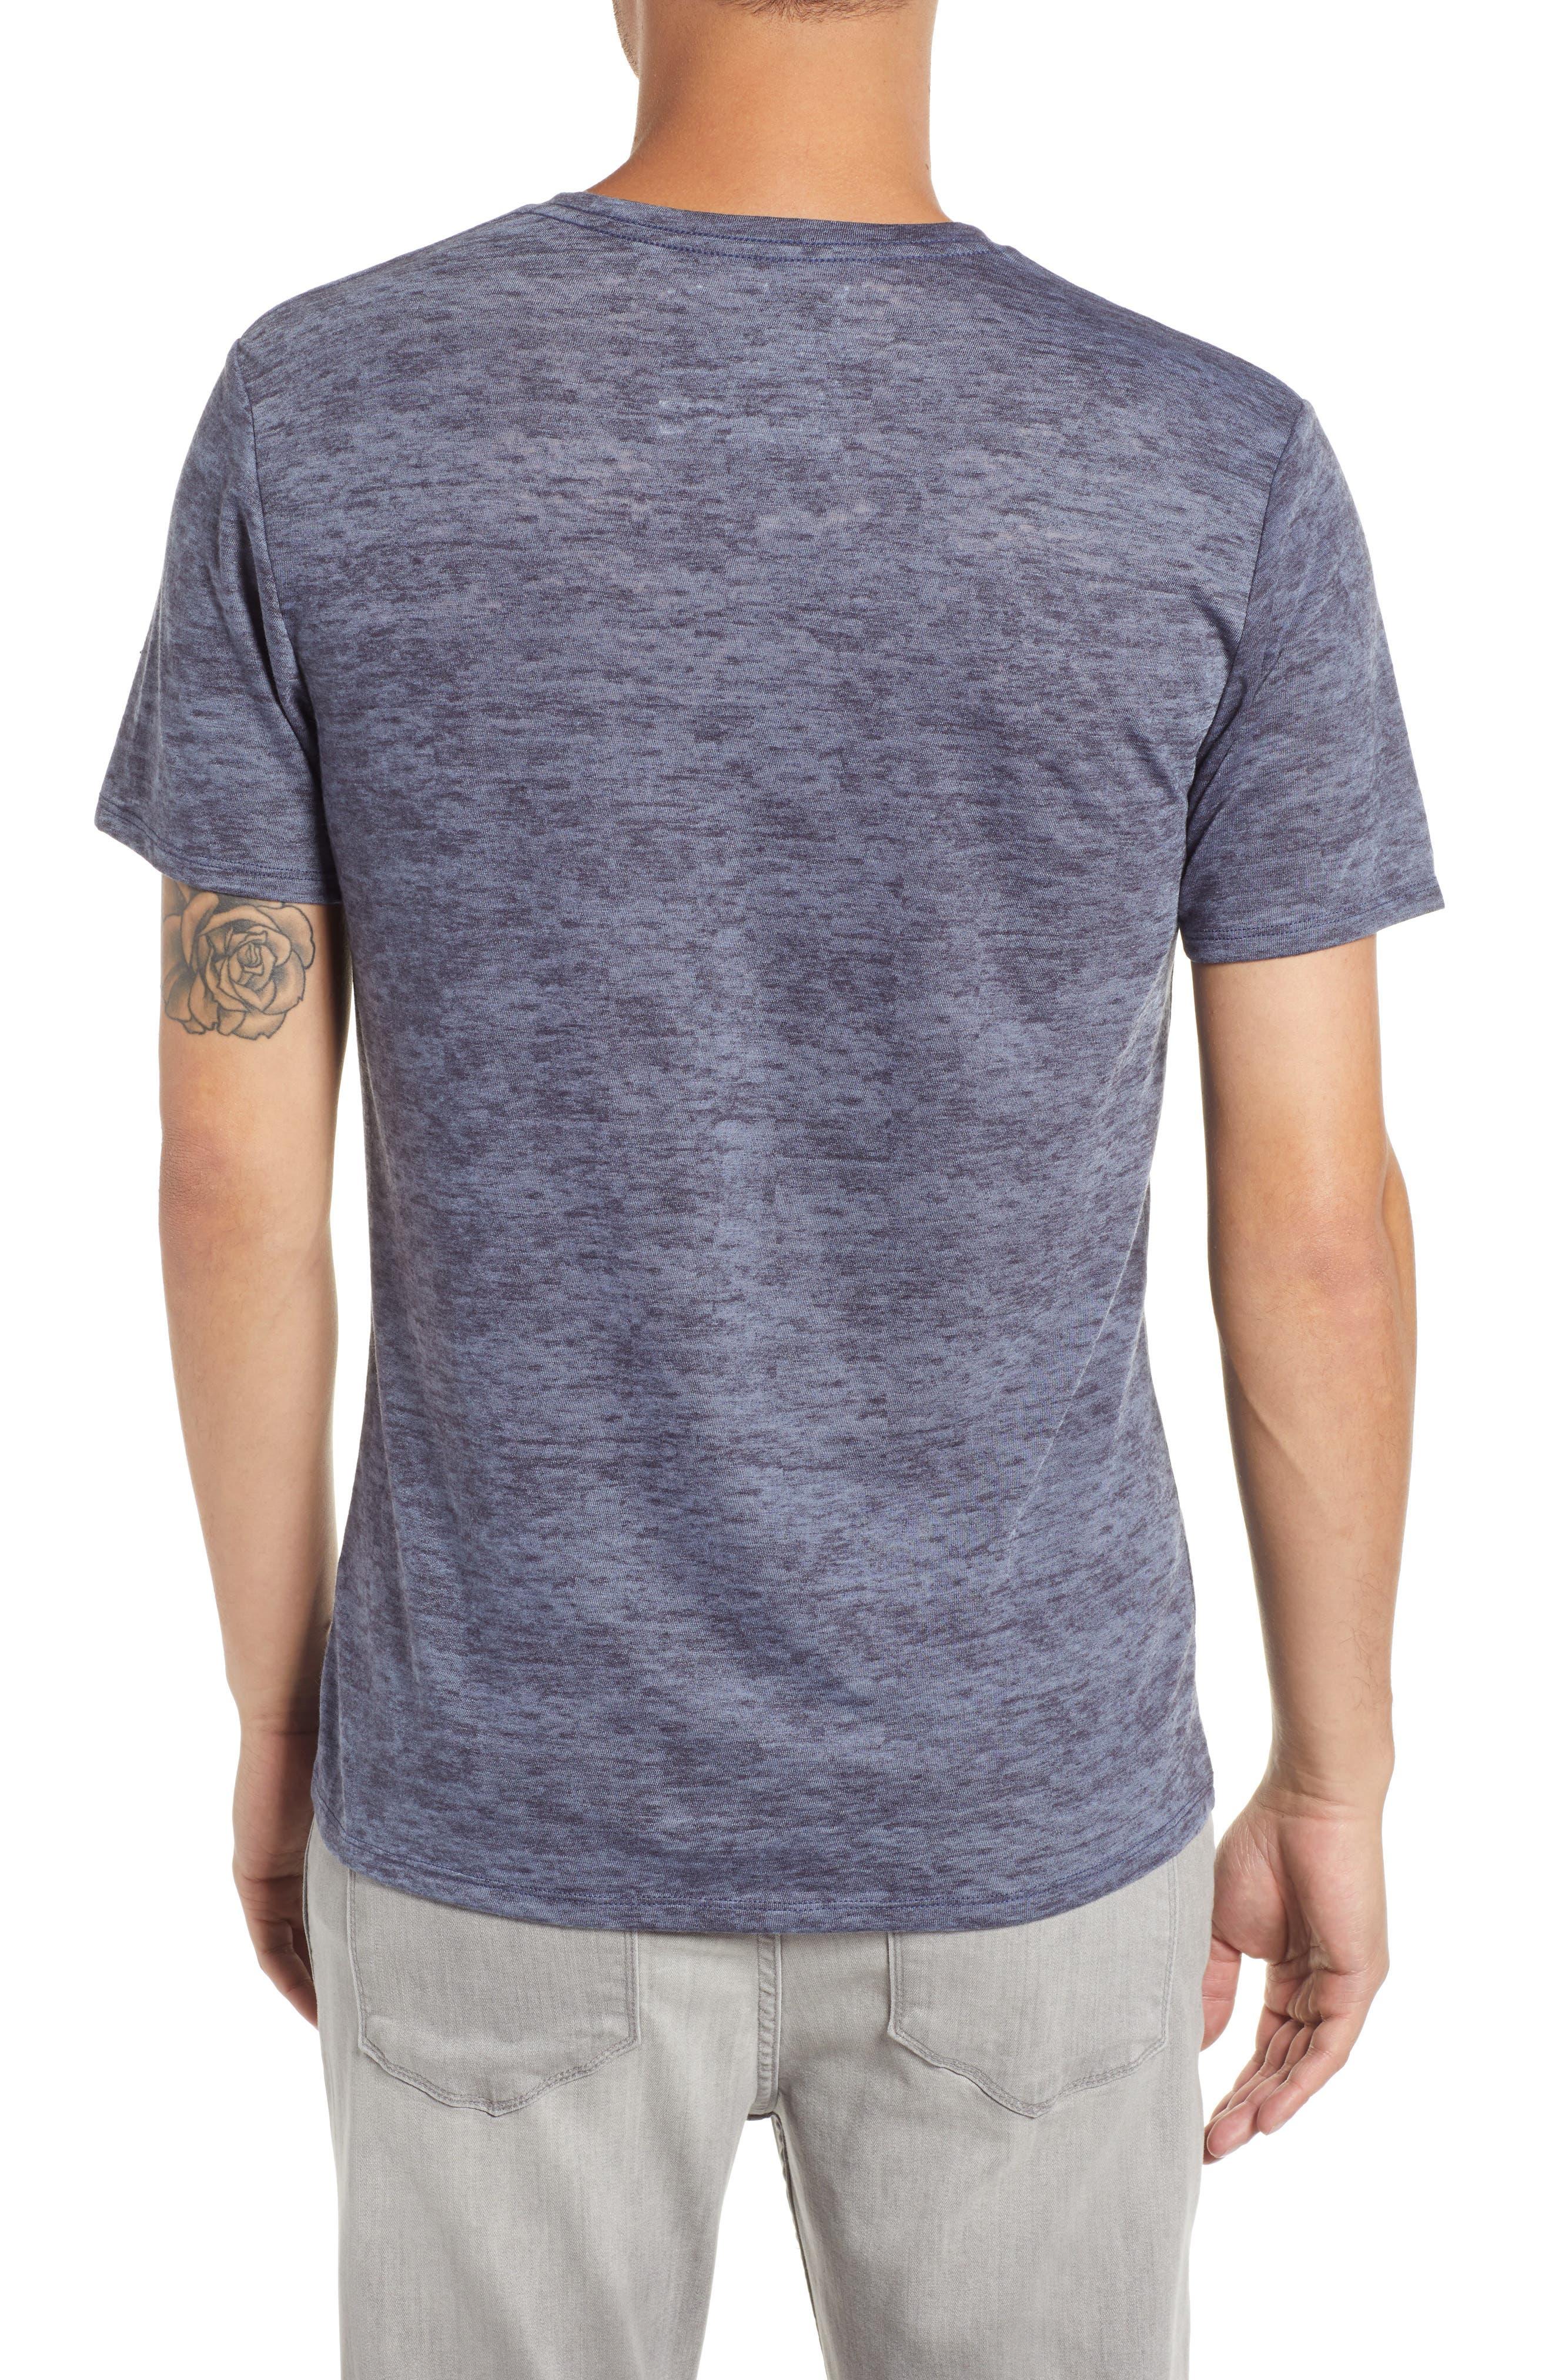 THE RAIL, Burnout V-Neck T-Shirt, Alternate thumbnail 2, color, BLUE STONEWASH - NAVY BURNOUT